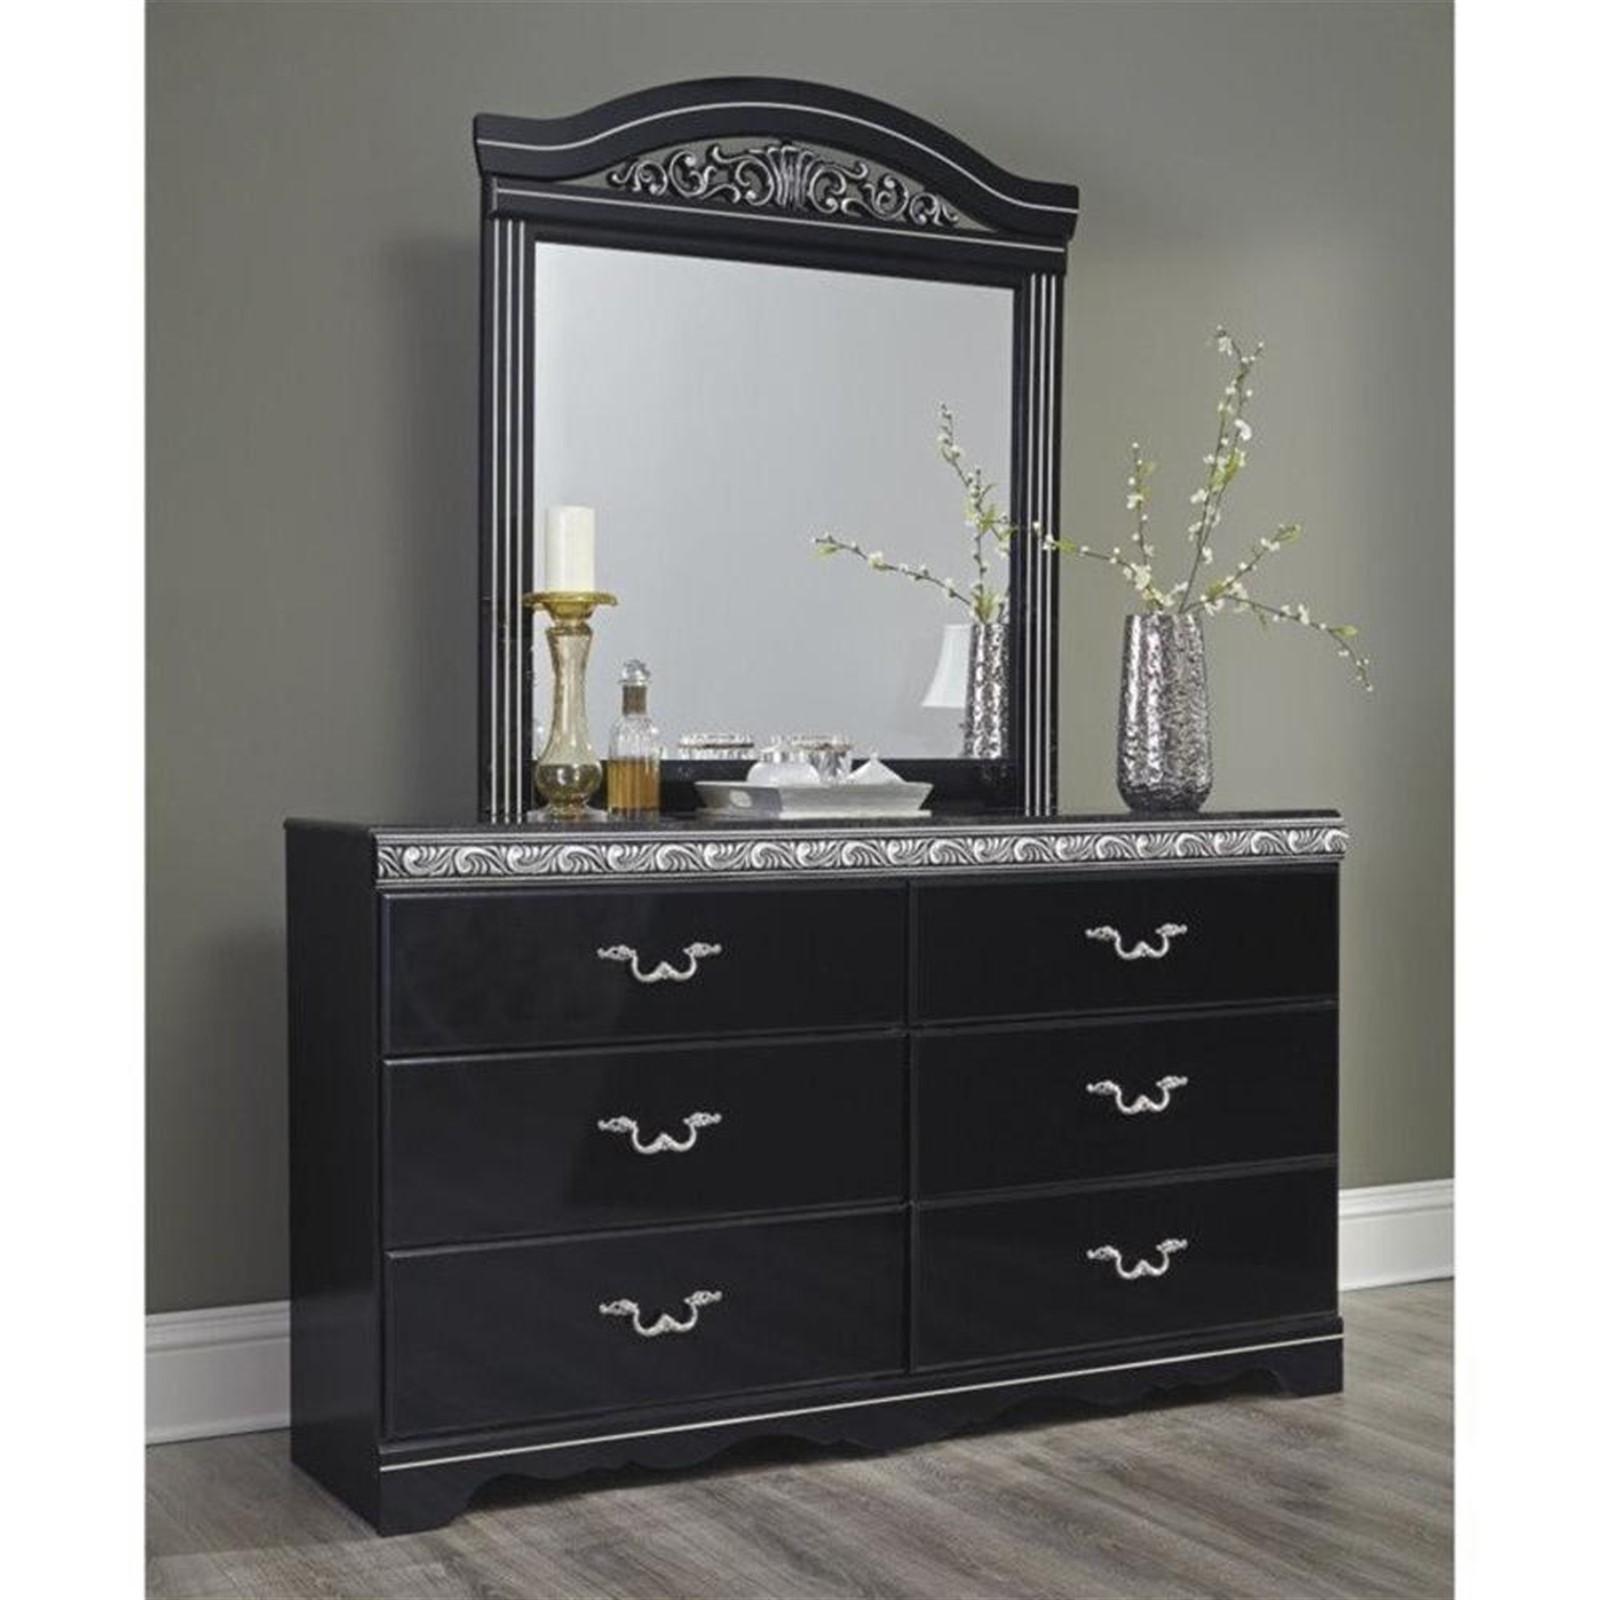 Constellations Dresser and Mirror Set - Black